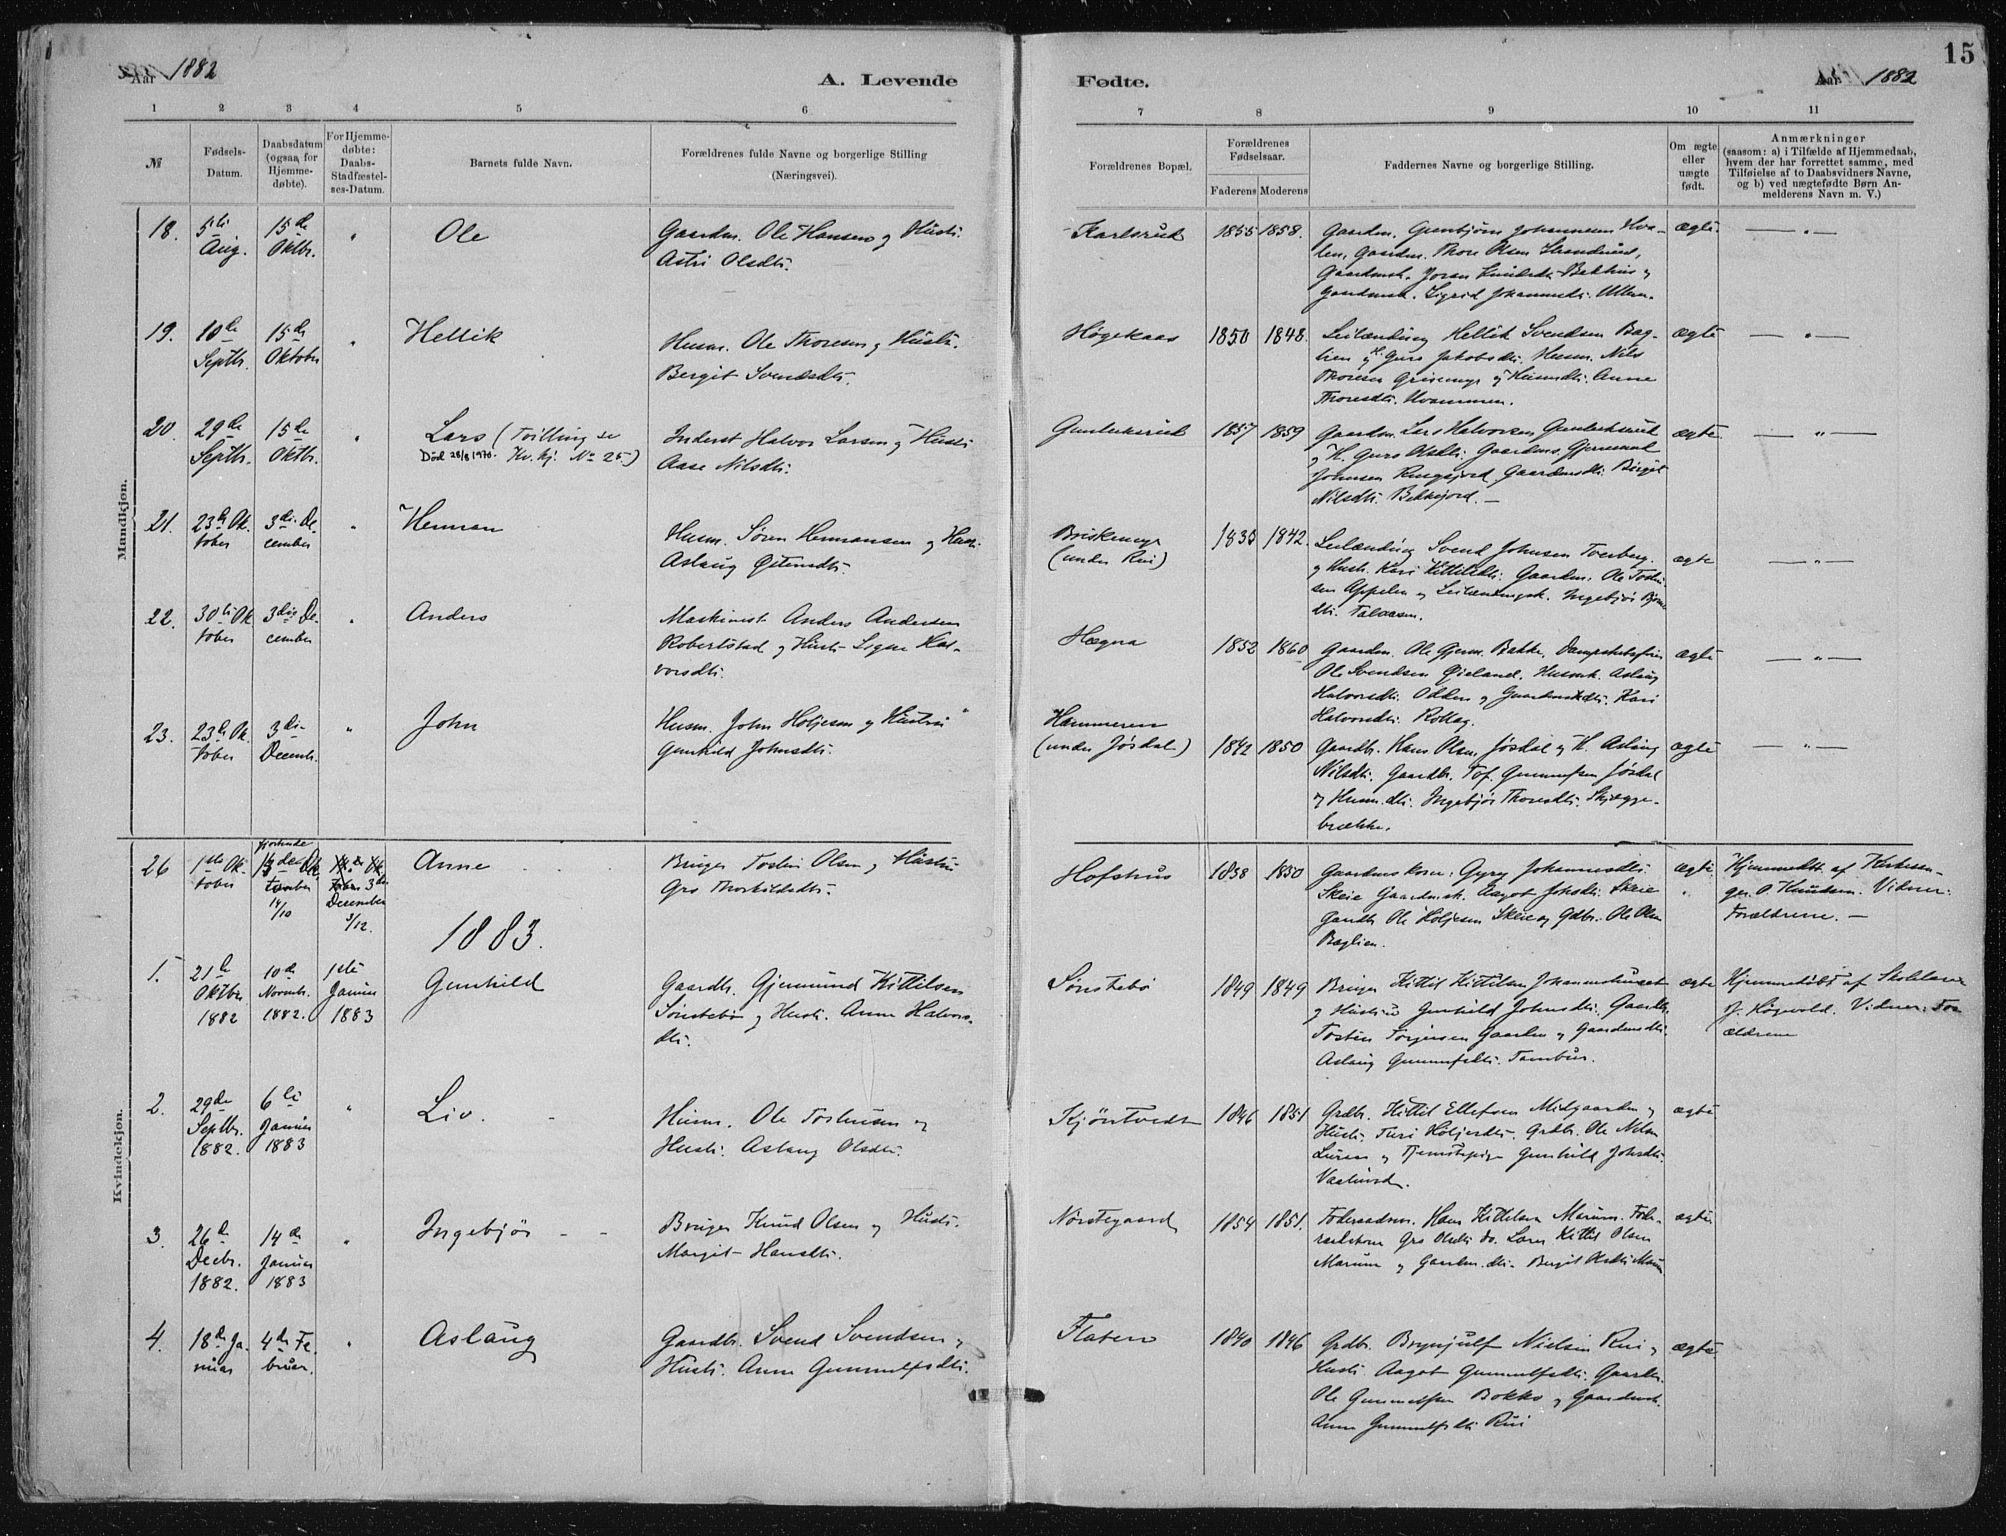 SAKO, Tinn kirkebøker, F/Fa/L0007: Ministerialbok nr. I 7, 1878-1922, s. 15